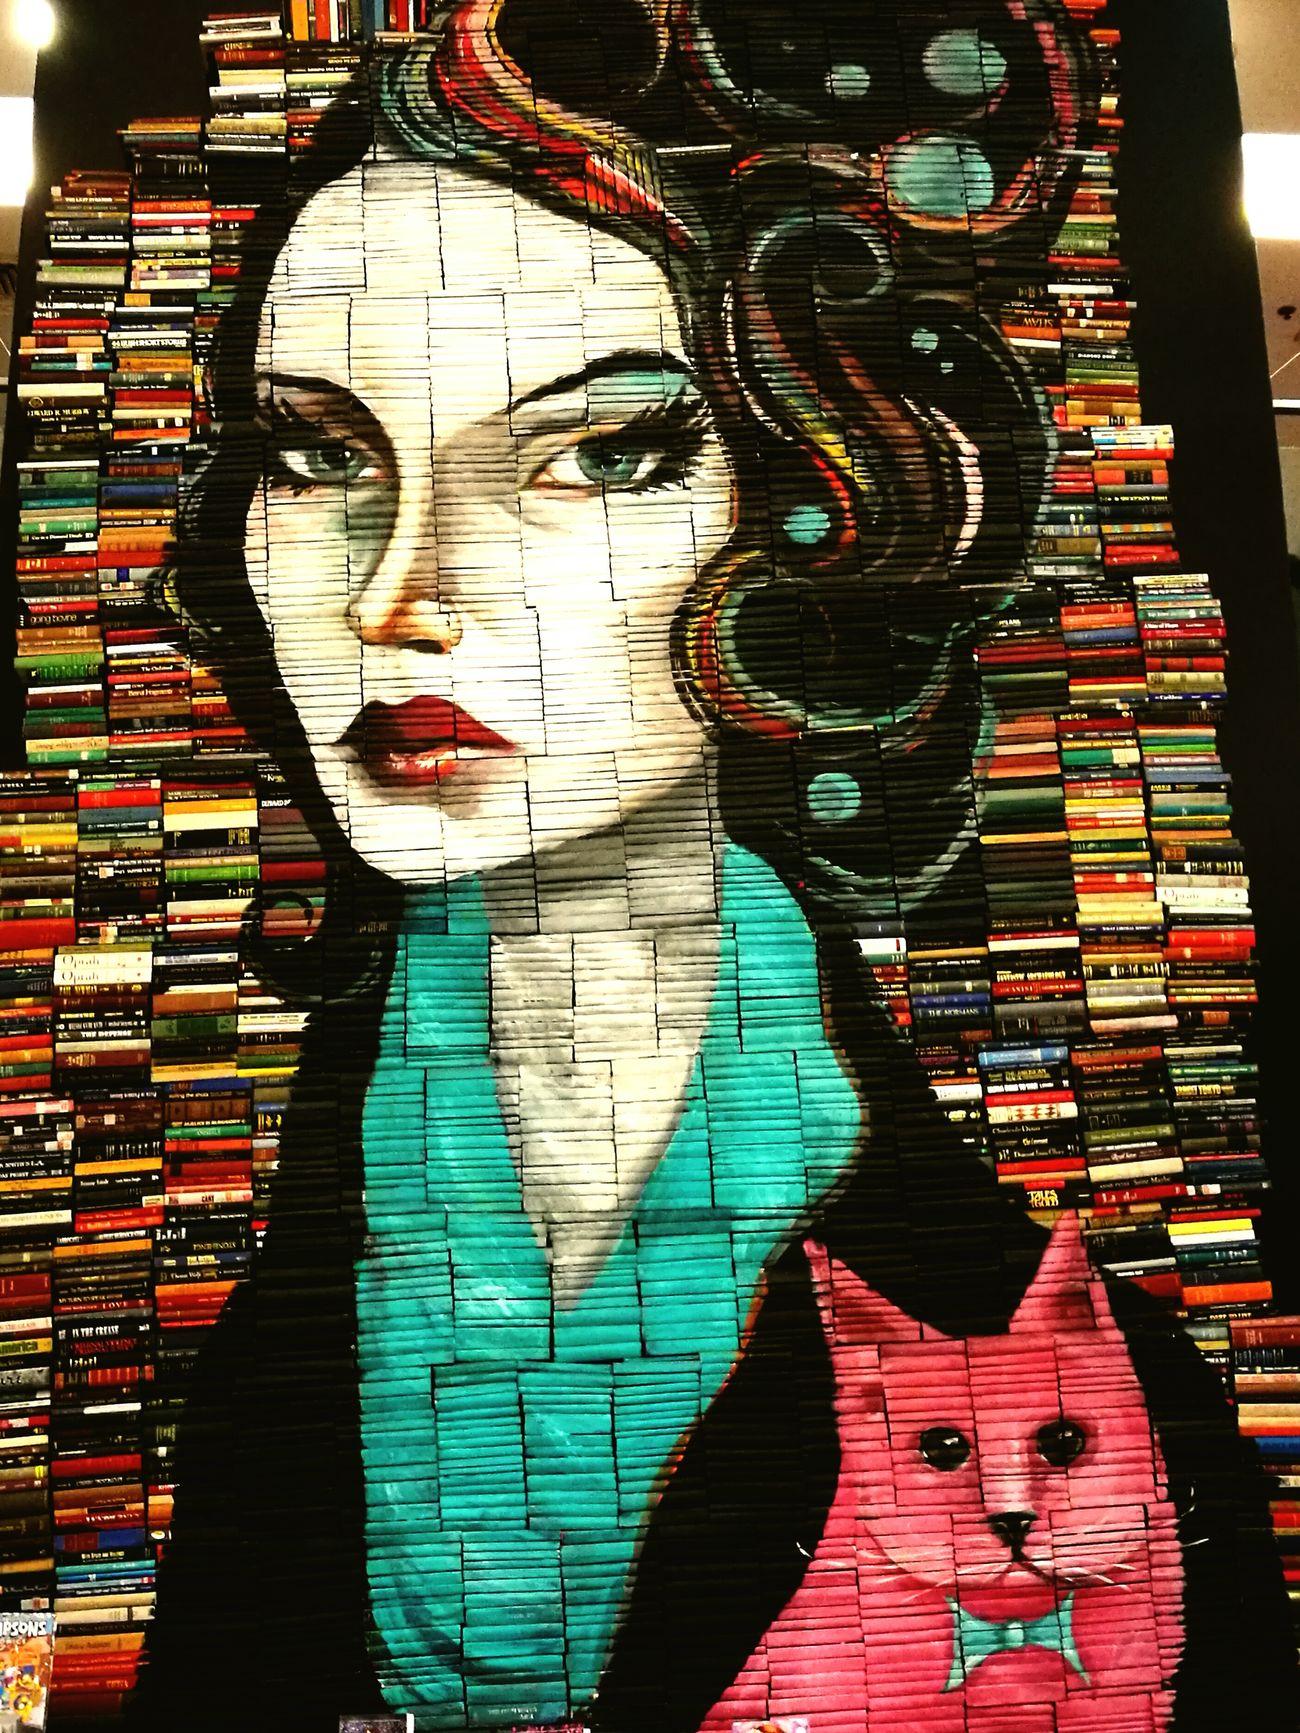 Art Multi Colored Creativity Art And Craft Book Books Bookstore Book Store Book Collections Bookporn Bookstagram Books ♥ Wallart Wall Art